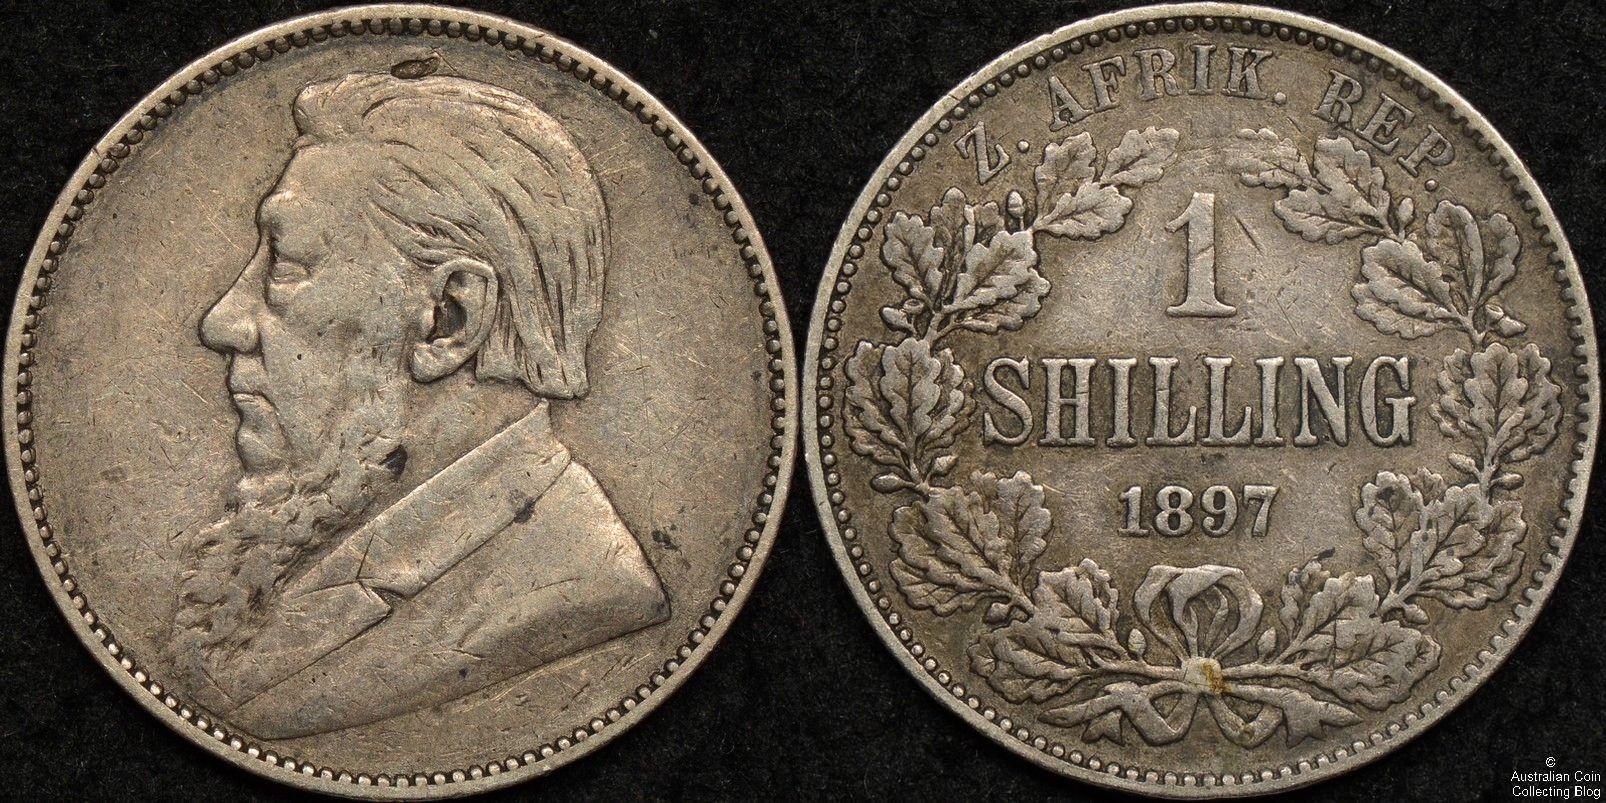 South Africa ZAR 1897 1s KM#5